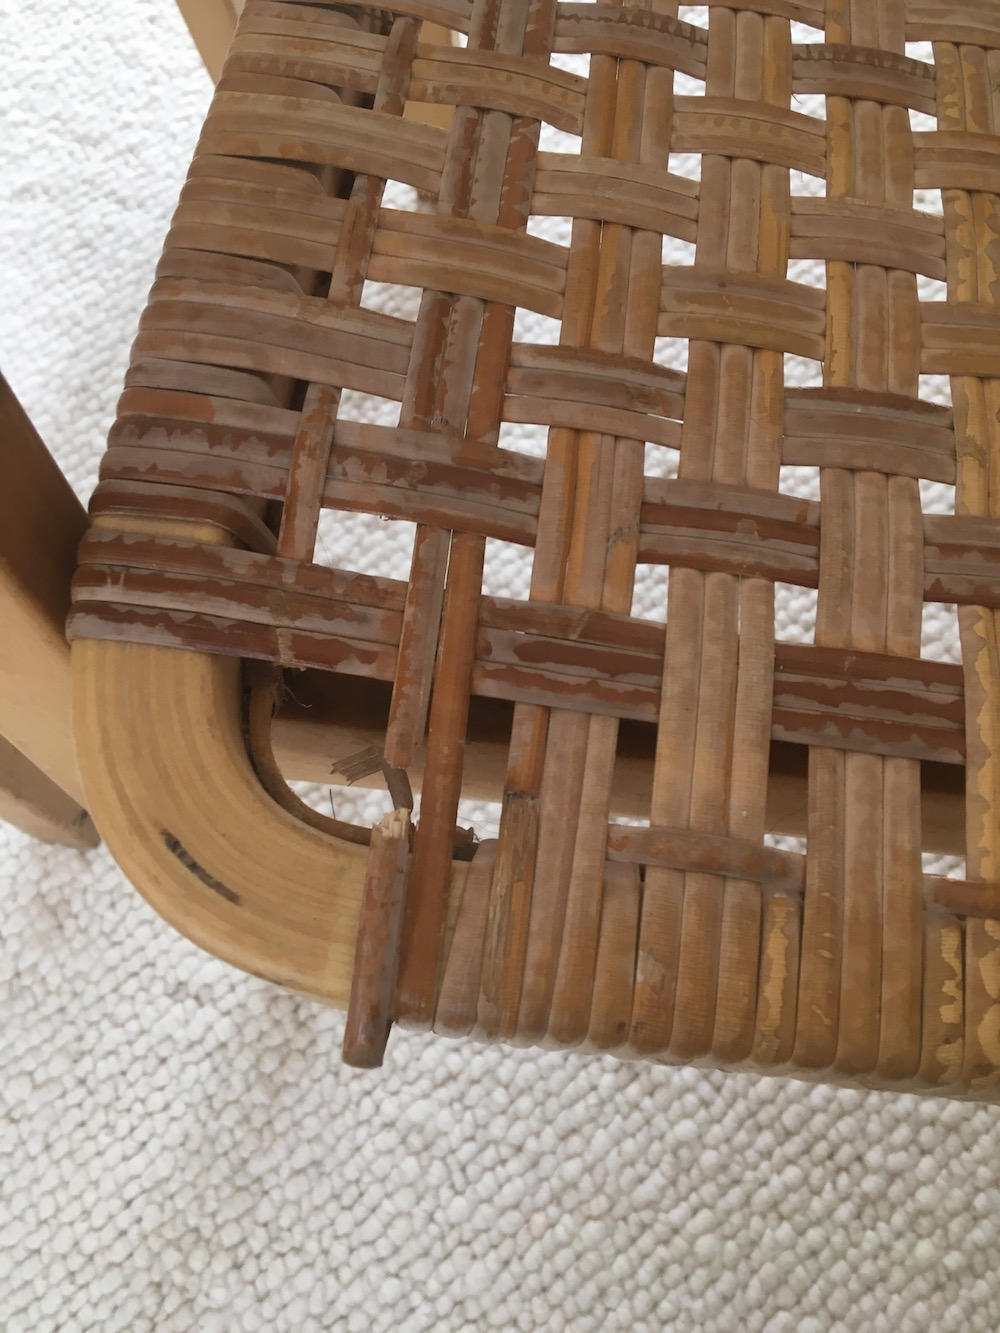 Alvar Aalto, Artek, vintage lounge chairs, Alvar Aalto 45 chair, lounge chairs